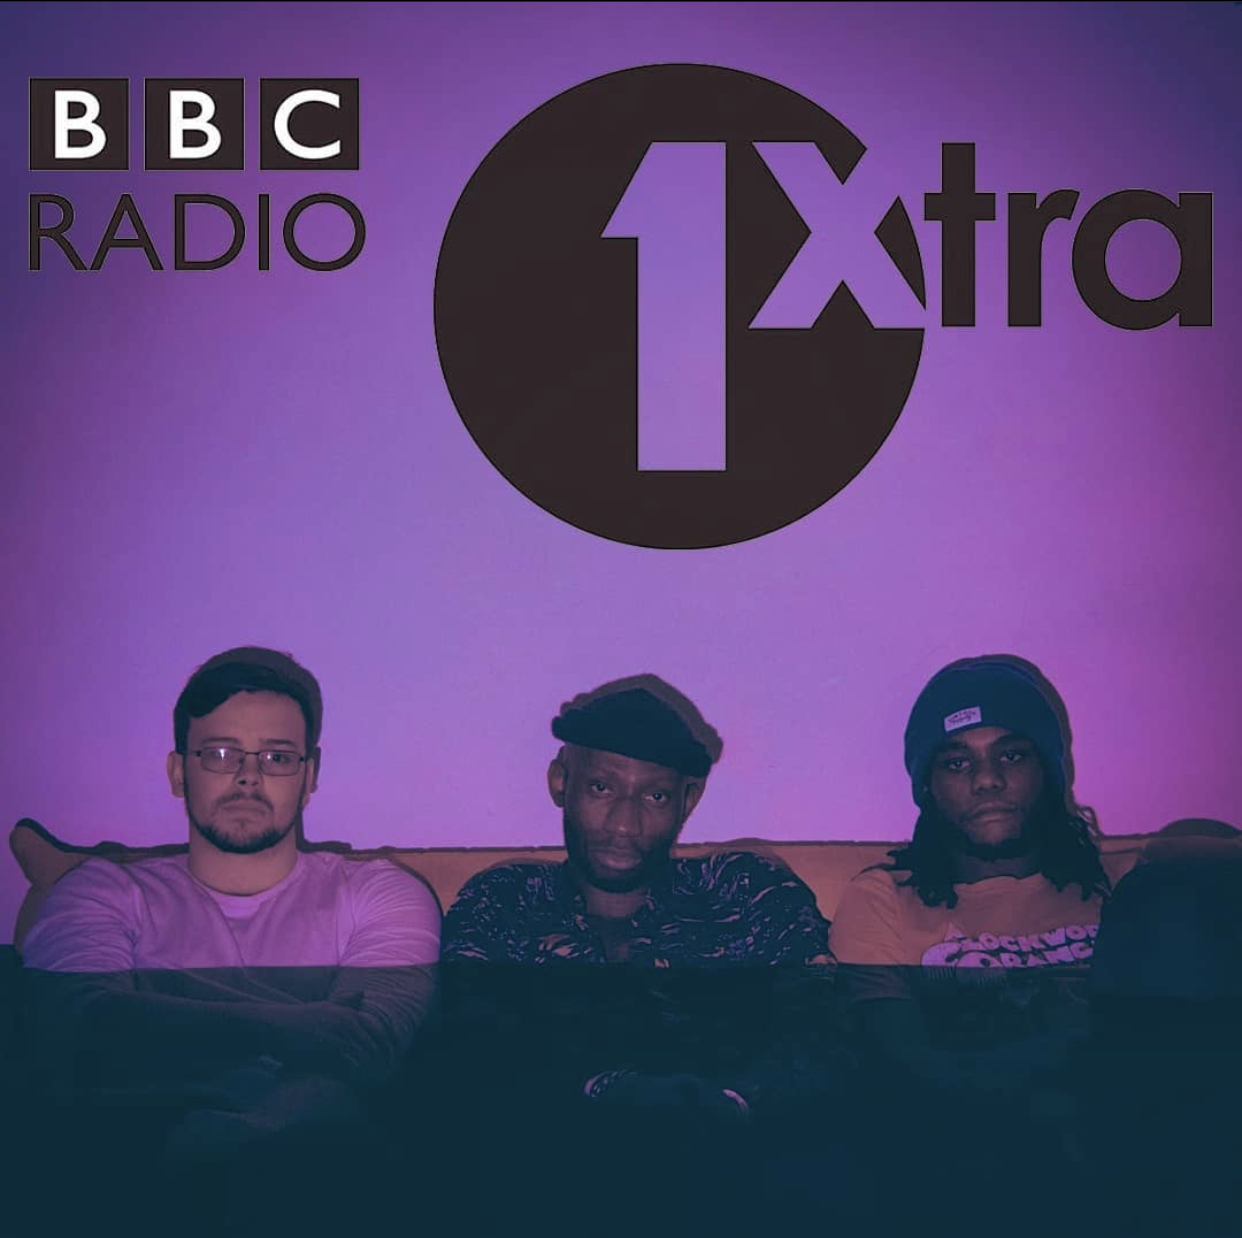 Shadeemus for BBC Radio 1Xtra